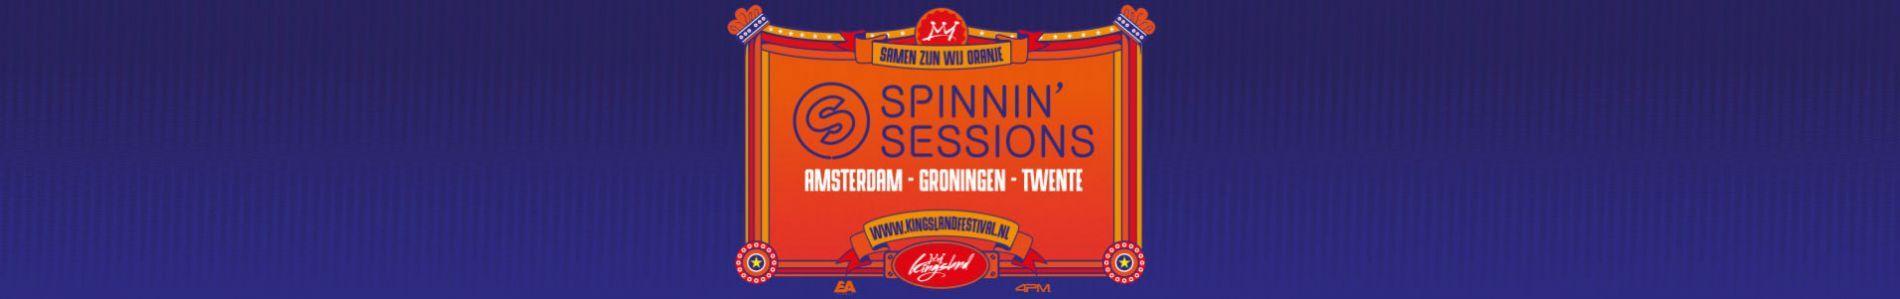 Spinnin' Sessions Spinnin' Sessions | Kingsland 2018